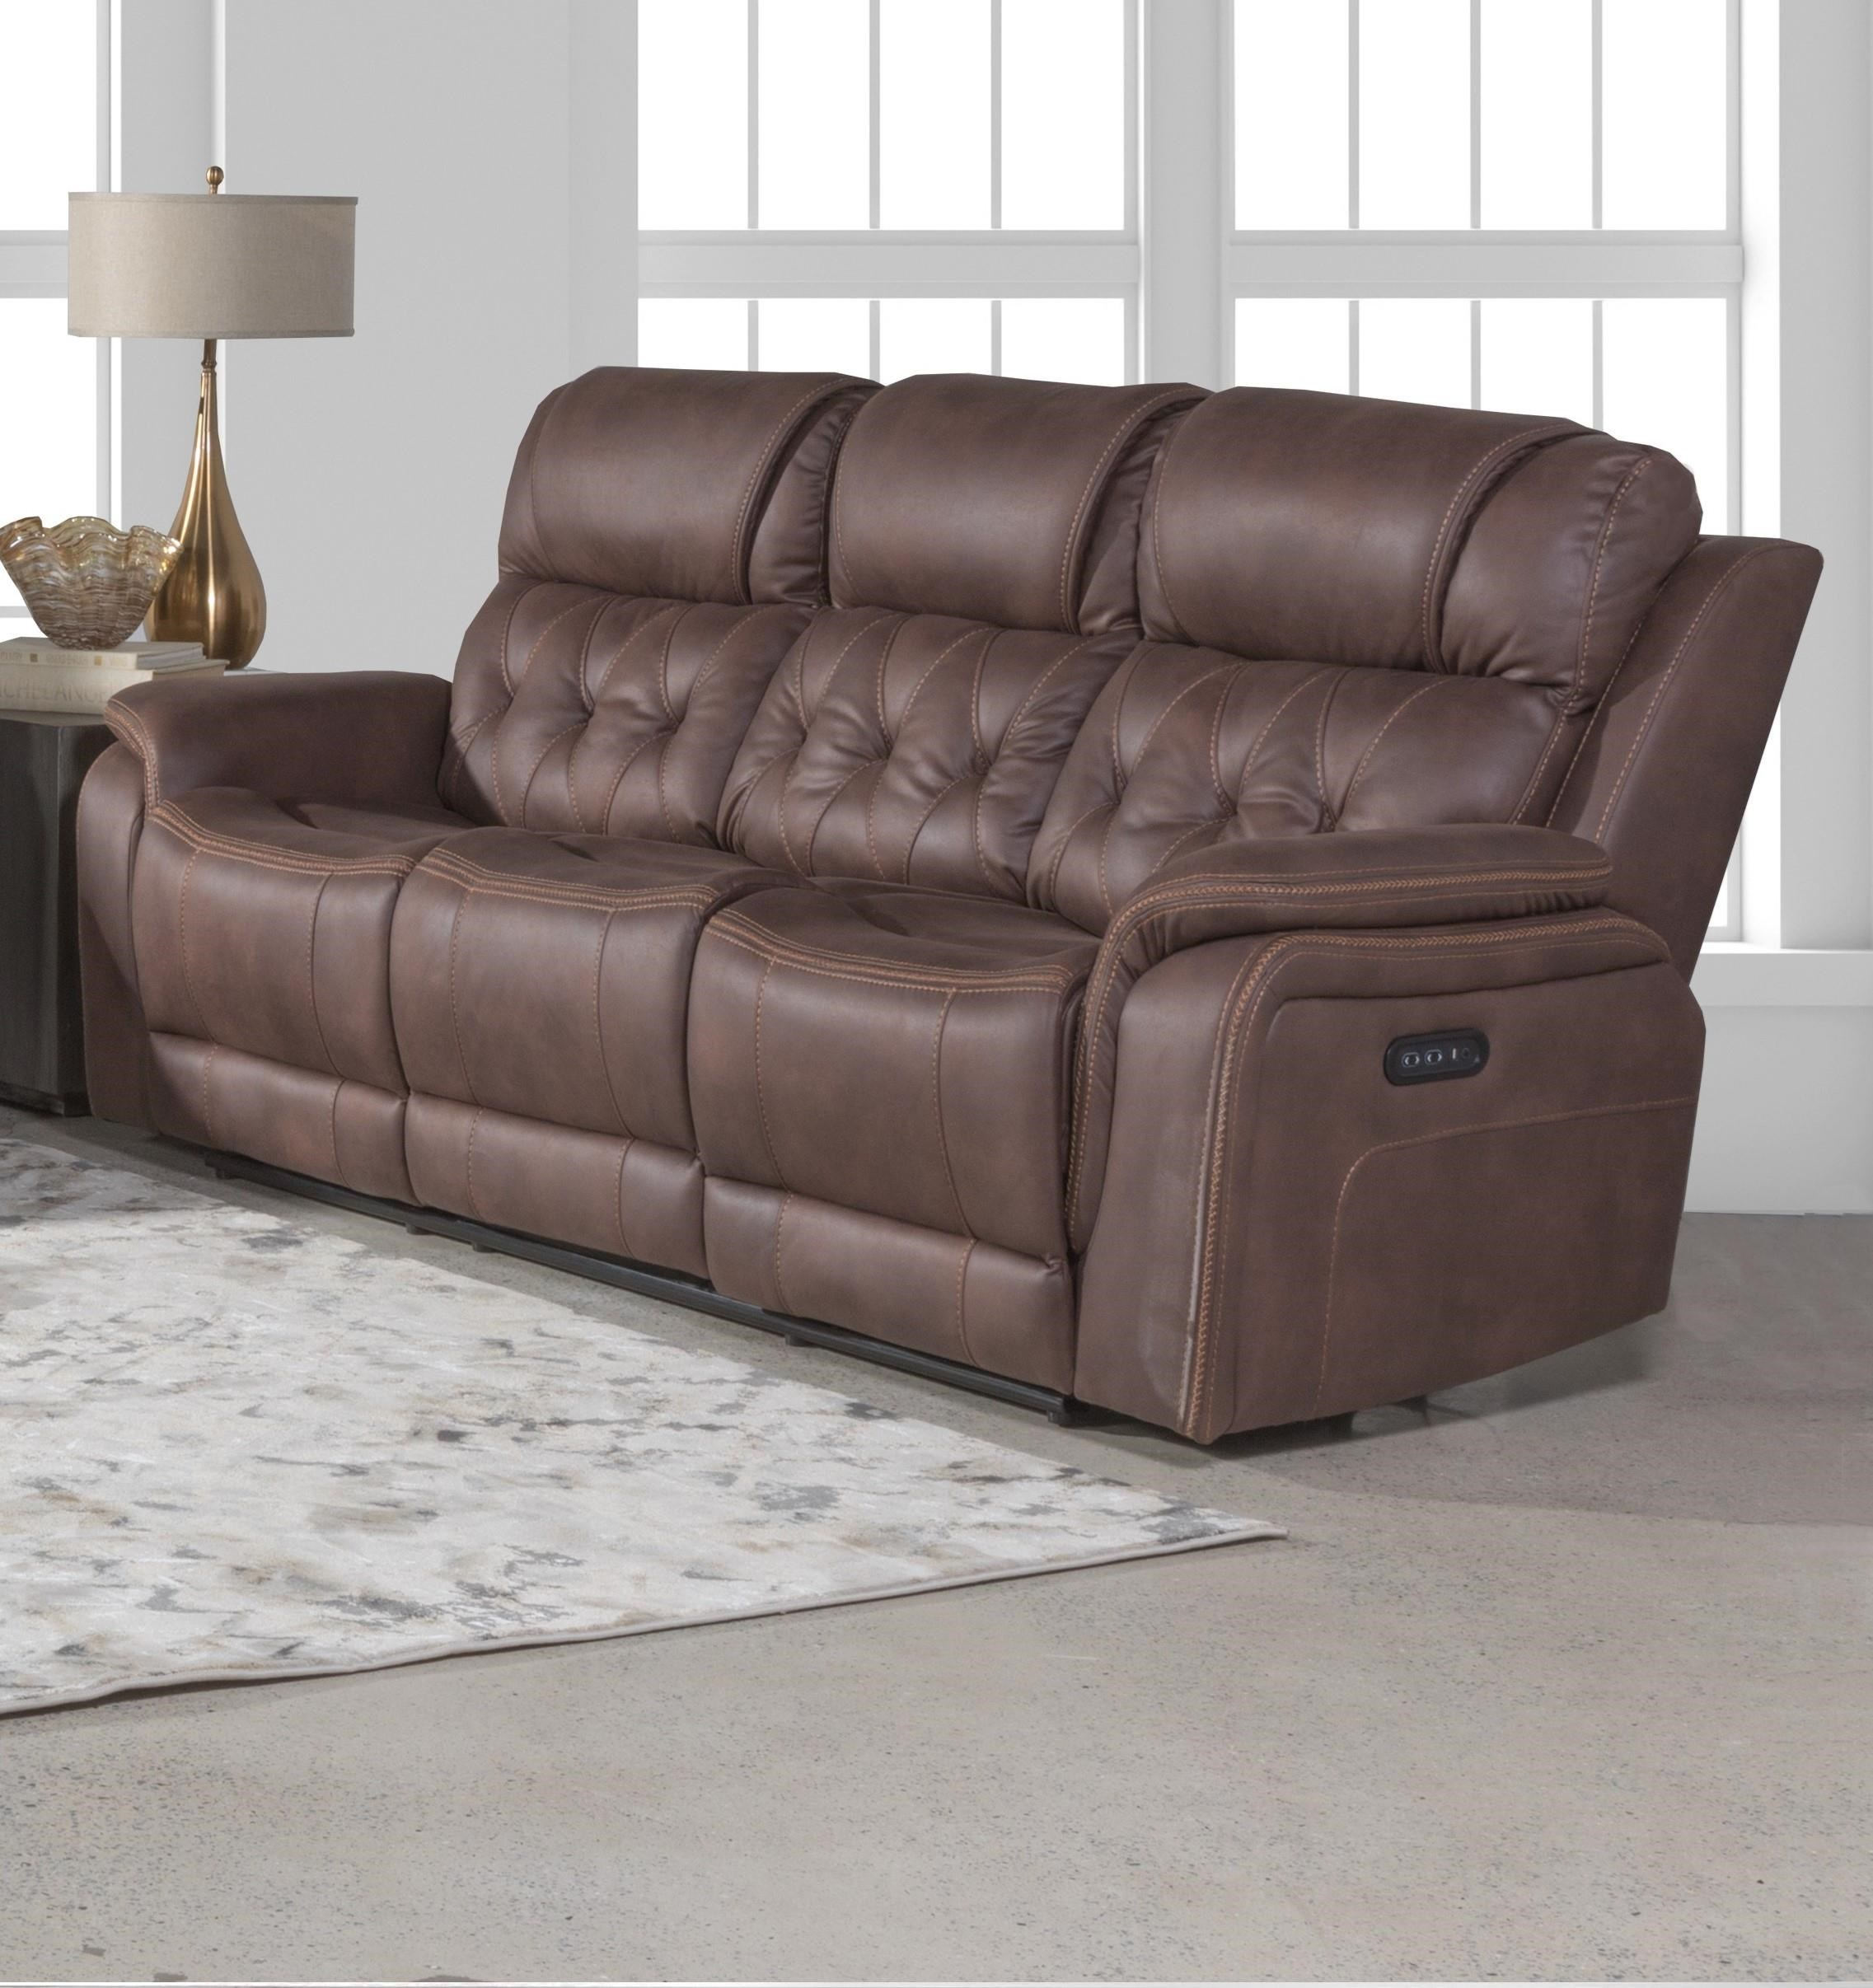 80243 RECLINING SOFA by Lifestyle at Furniture Fair - North Carolina